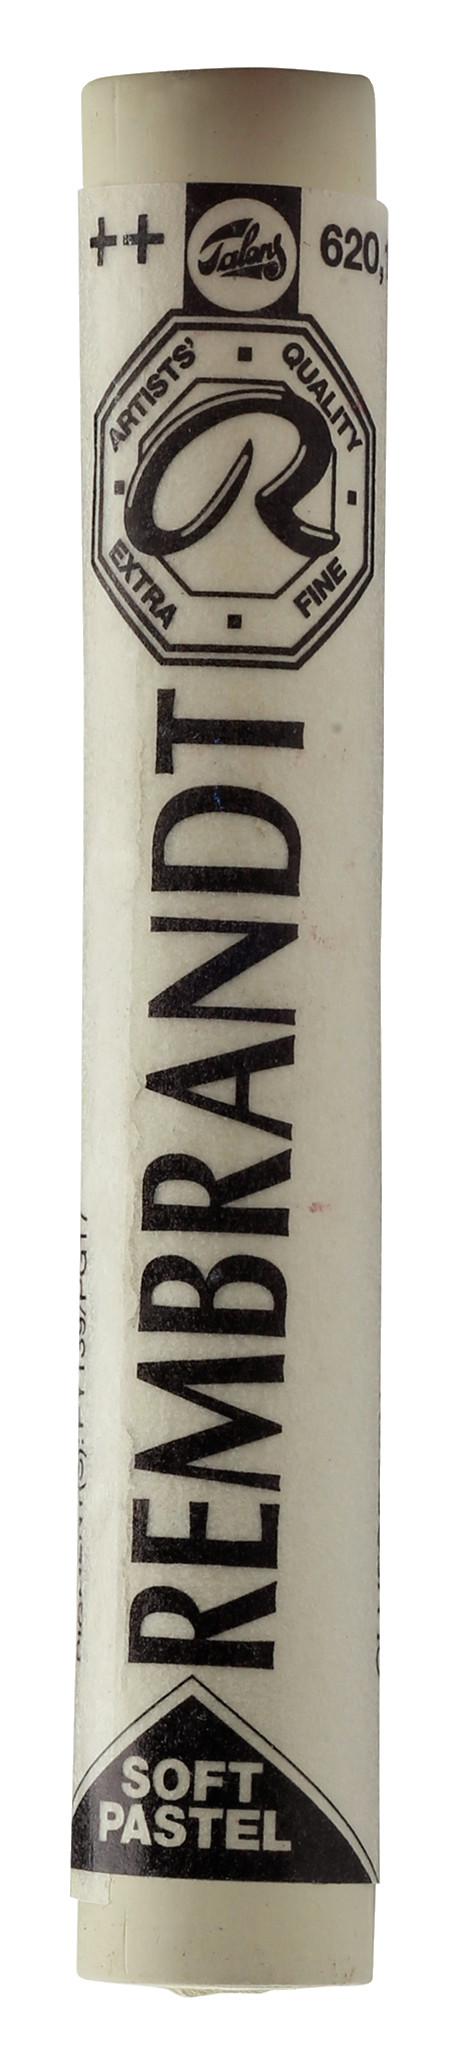 Rembrandt Soft Pastel Round Full Stick Olive Green(10) (620.1)